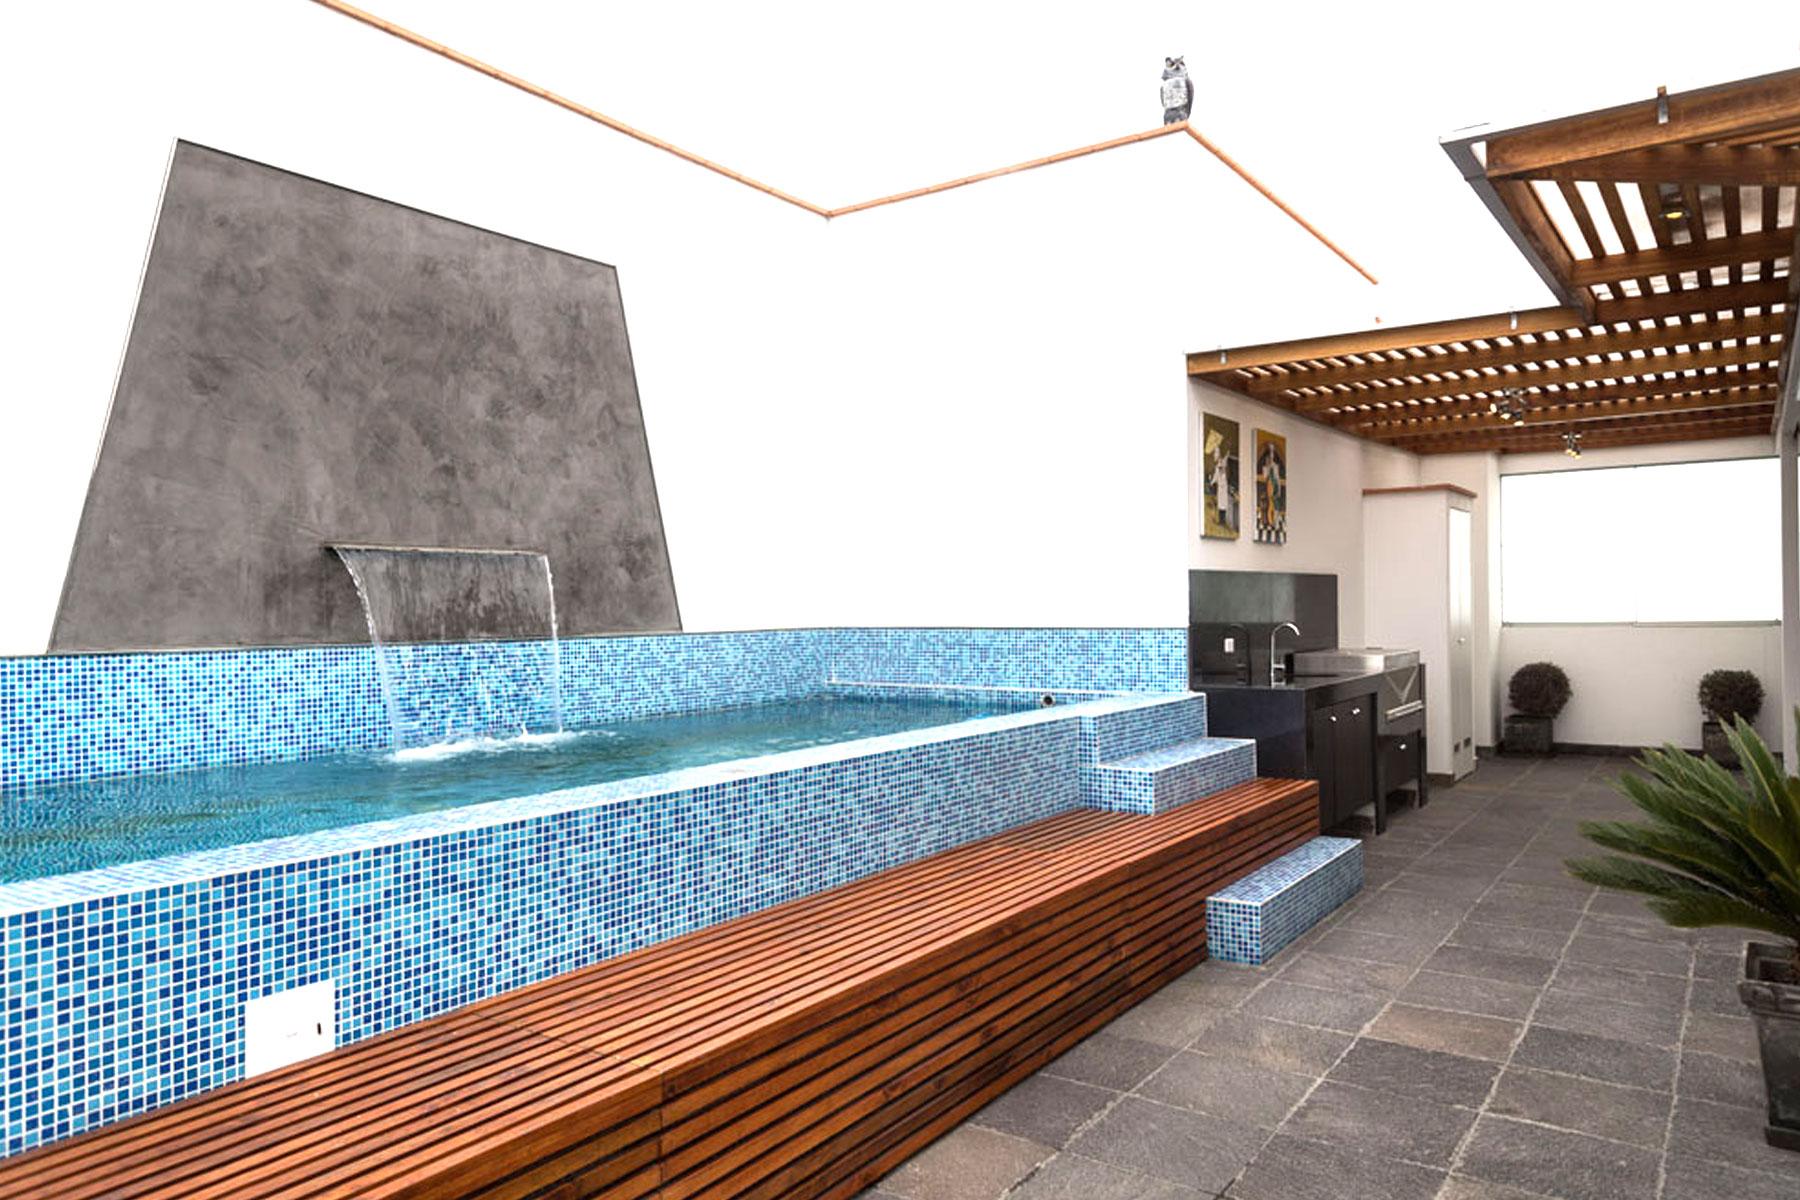 Apartment for Sale at Extraordinario pent-house de estreno con acabados de primera Av. Jorge Chavez Miraflores, Lima, 18 Peru